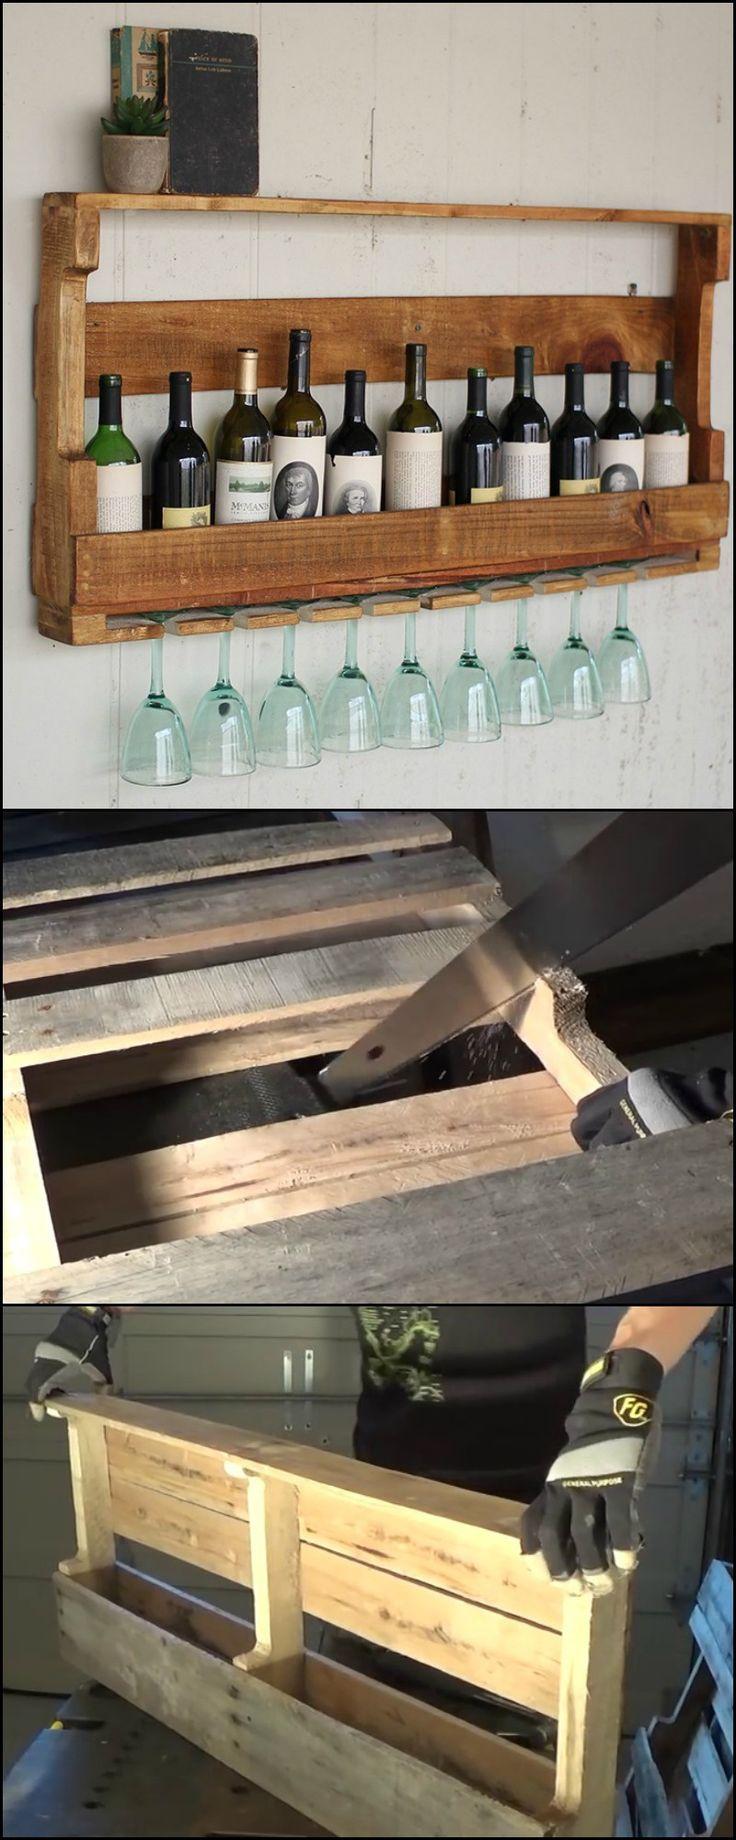 Diy Wooden Pallet Wine Rack Best Wood 2017